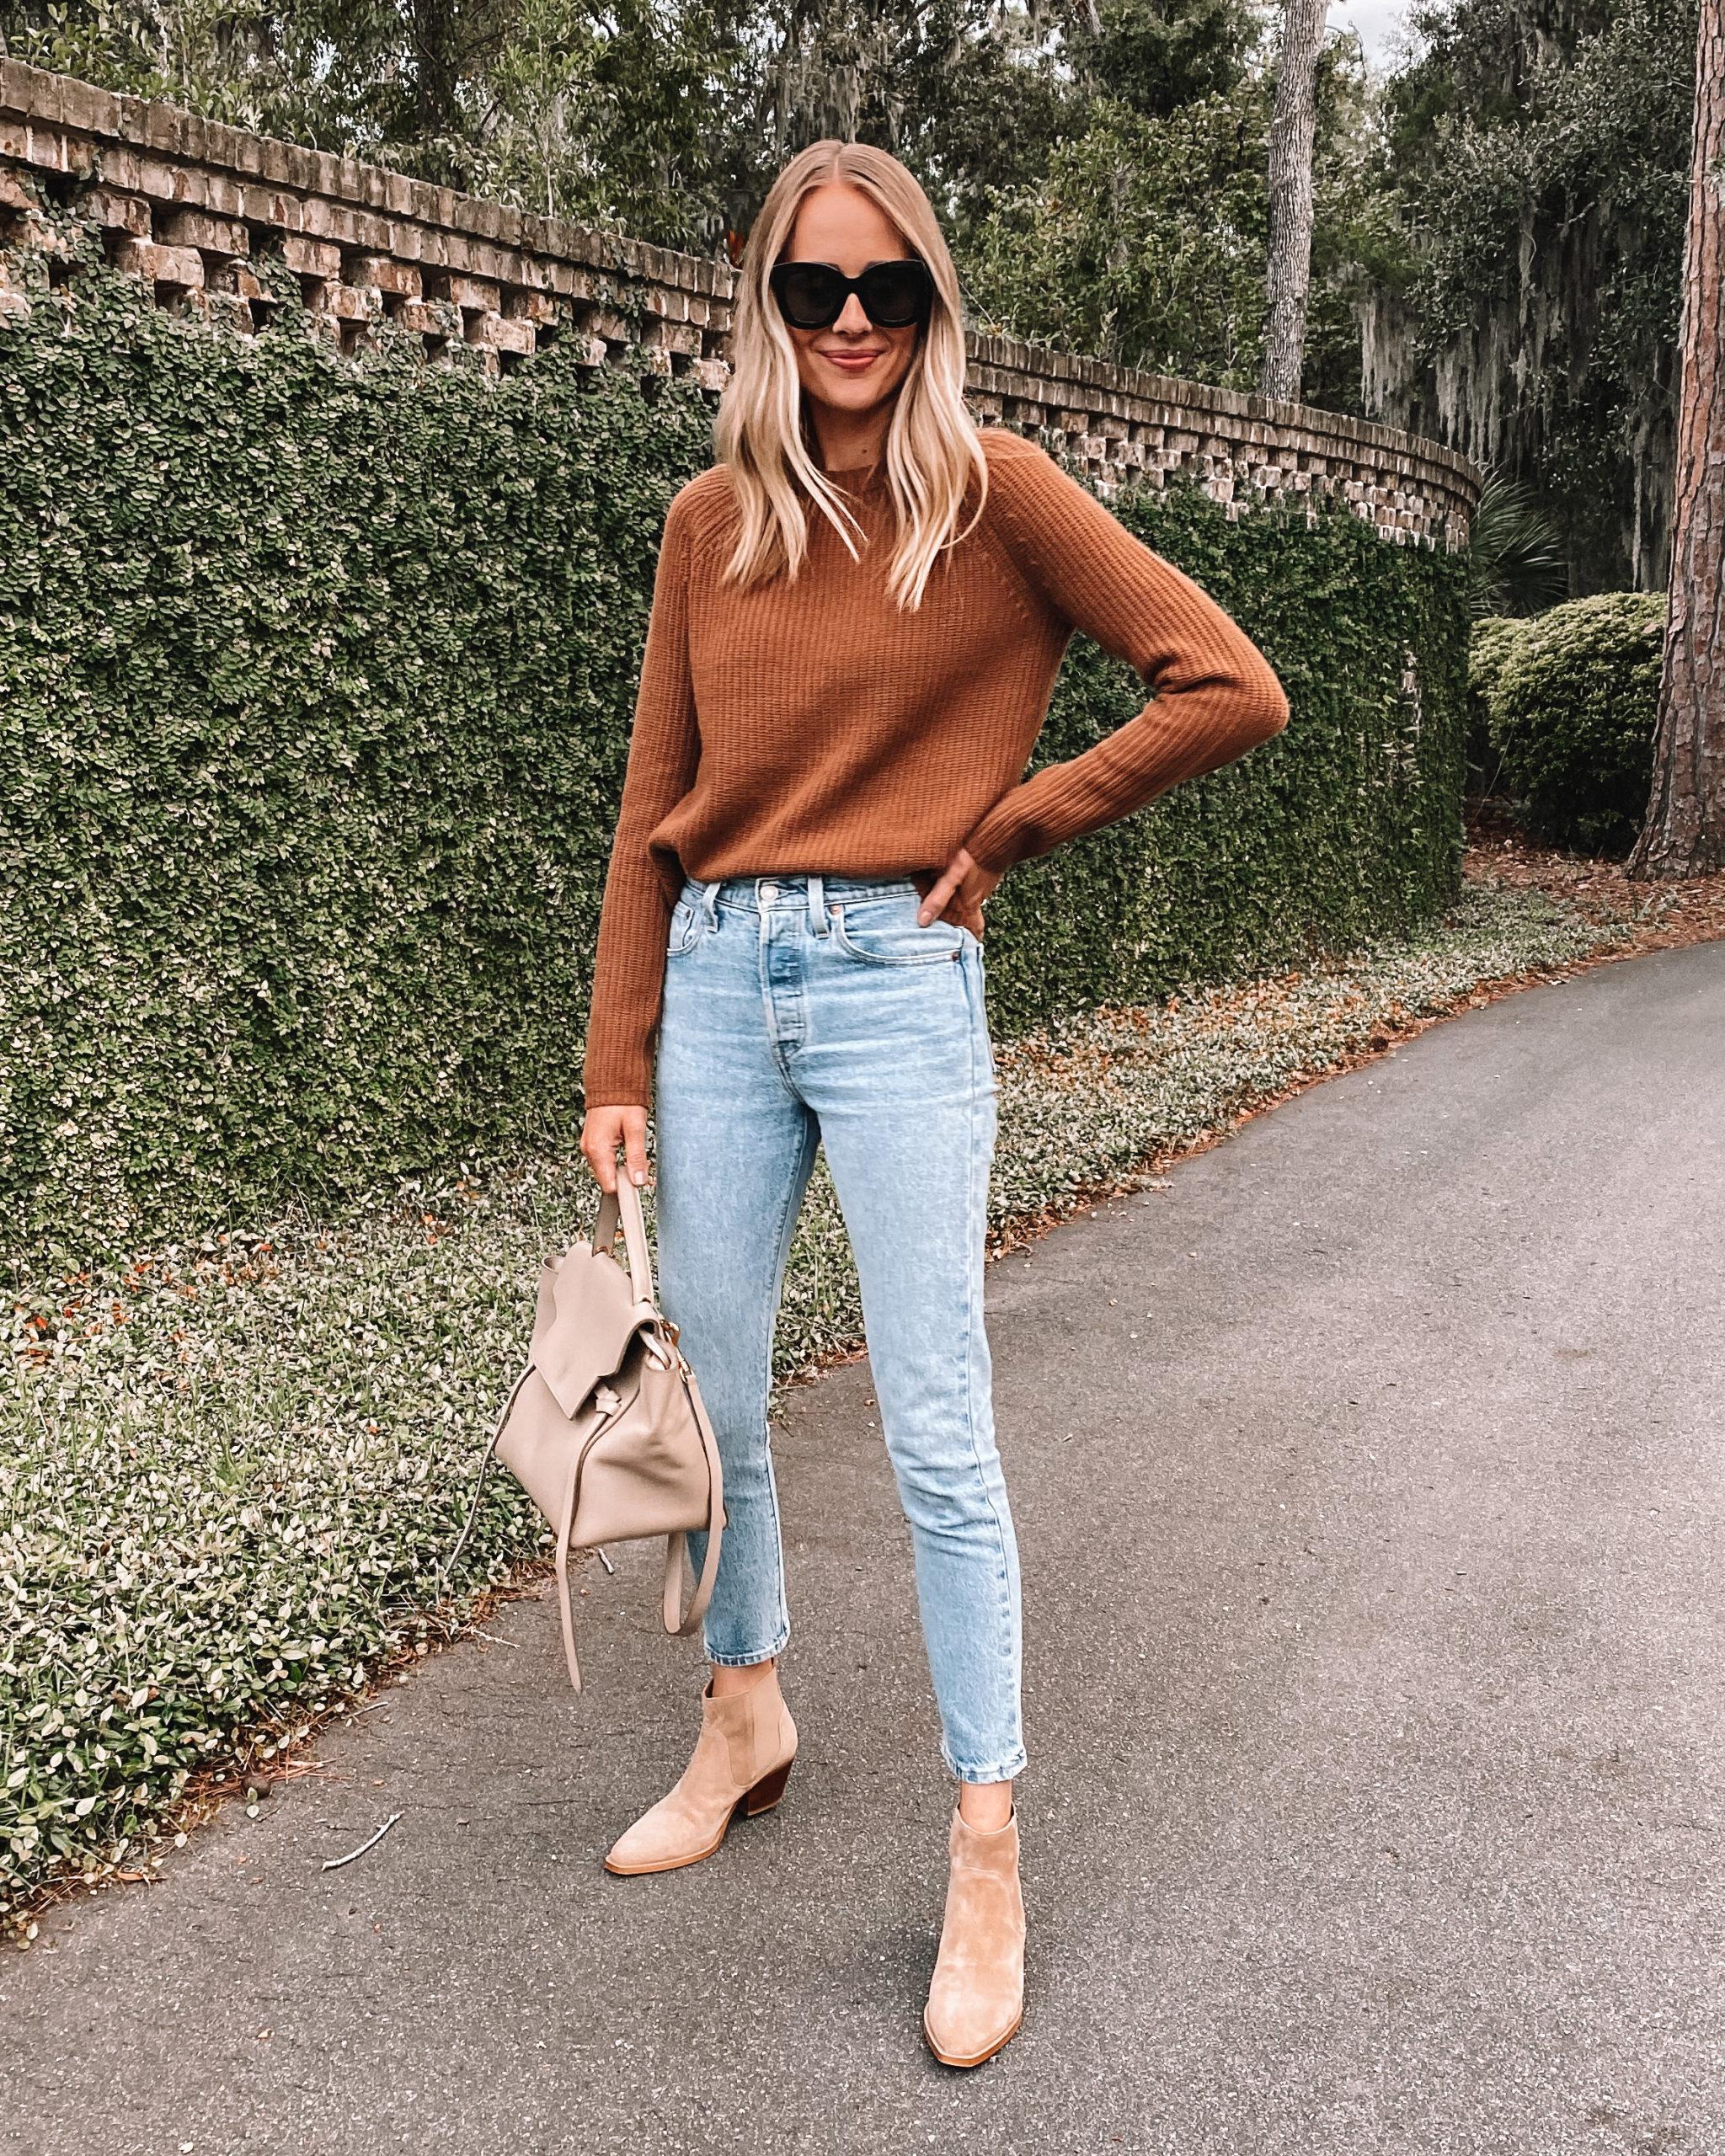 Fashion Jackson Wearing Jenni Kayne Sweater Levis 501 Jeans Everlane Tan Suede Booties